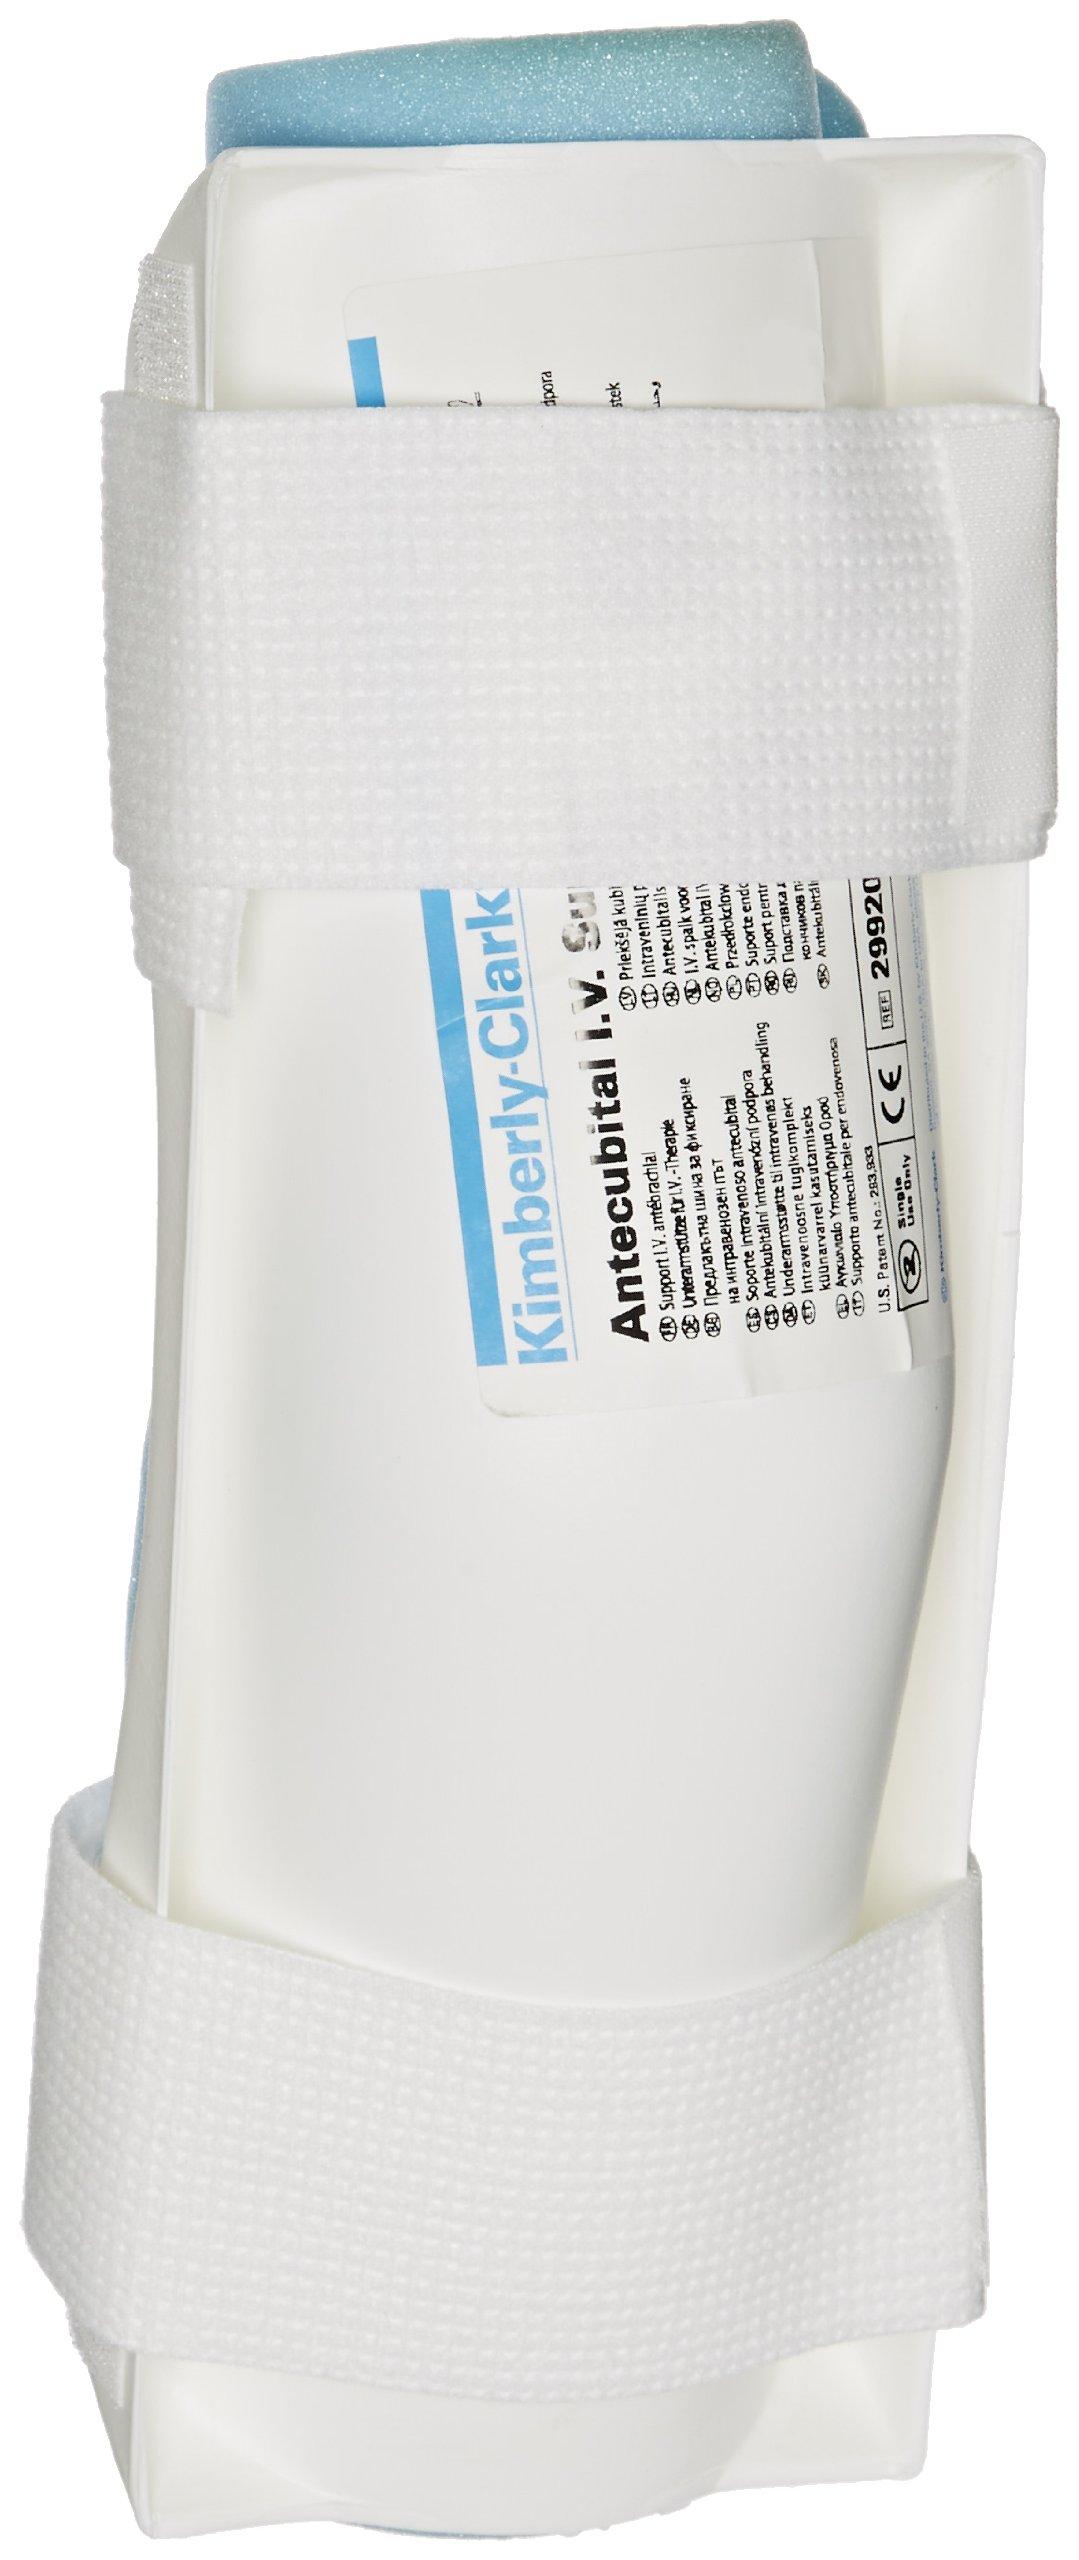 Halyard Health 29920 Antecubital I.V. Support, 12.5 inch L x 4.5 inch W (Case of 10)